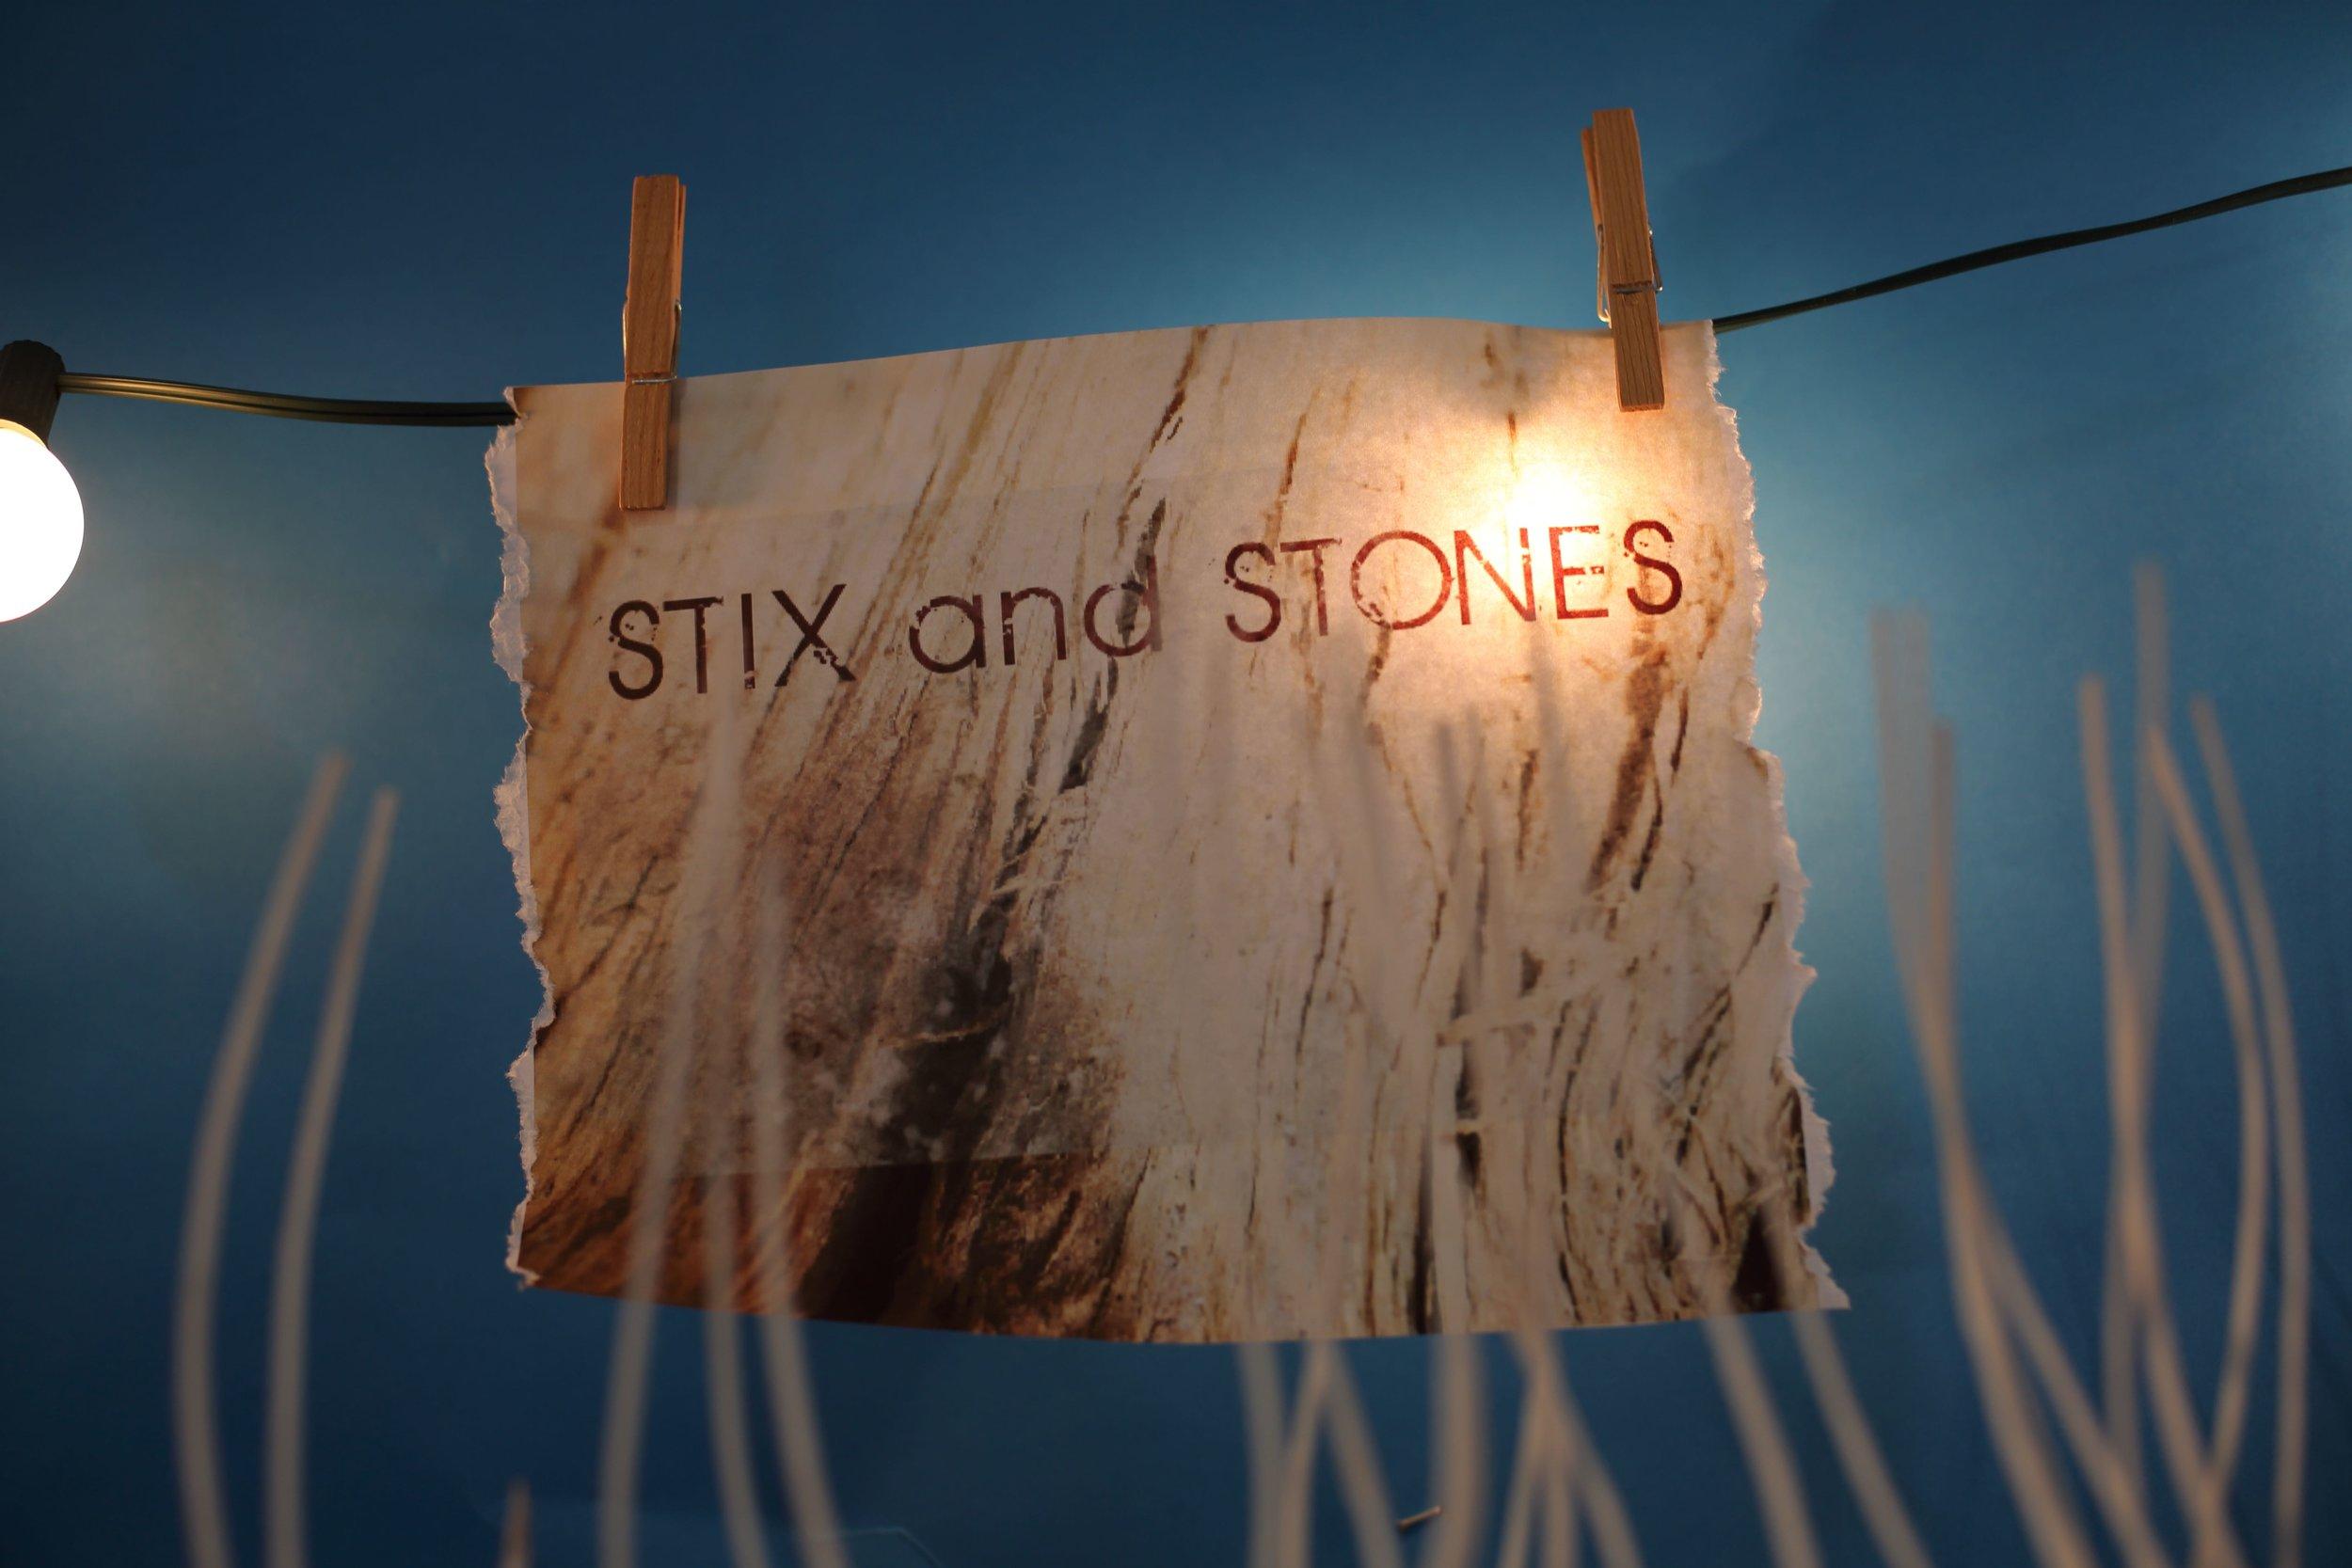 Stick and Stones